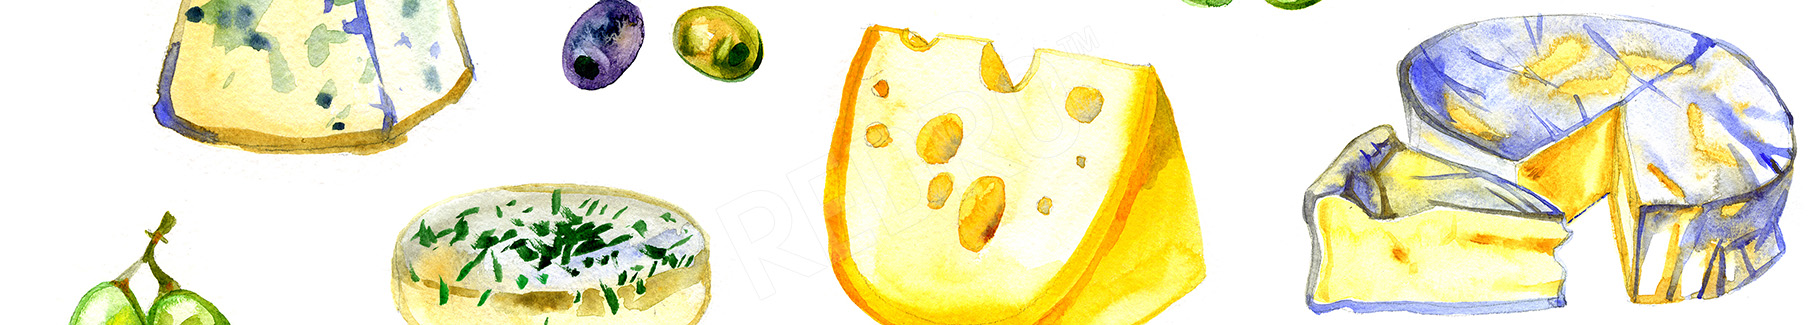 Fototapeta różne rodzaje sera